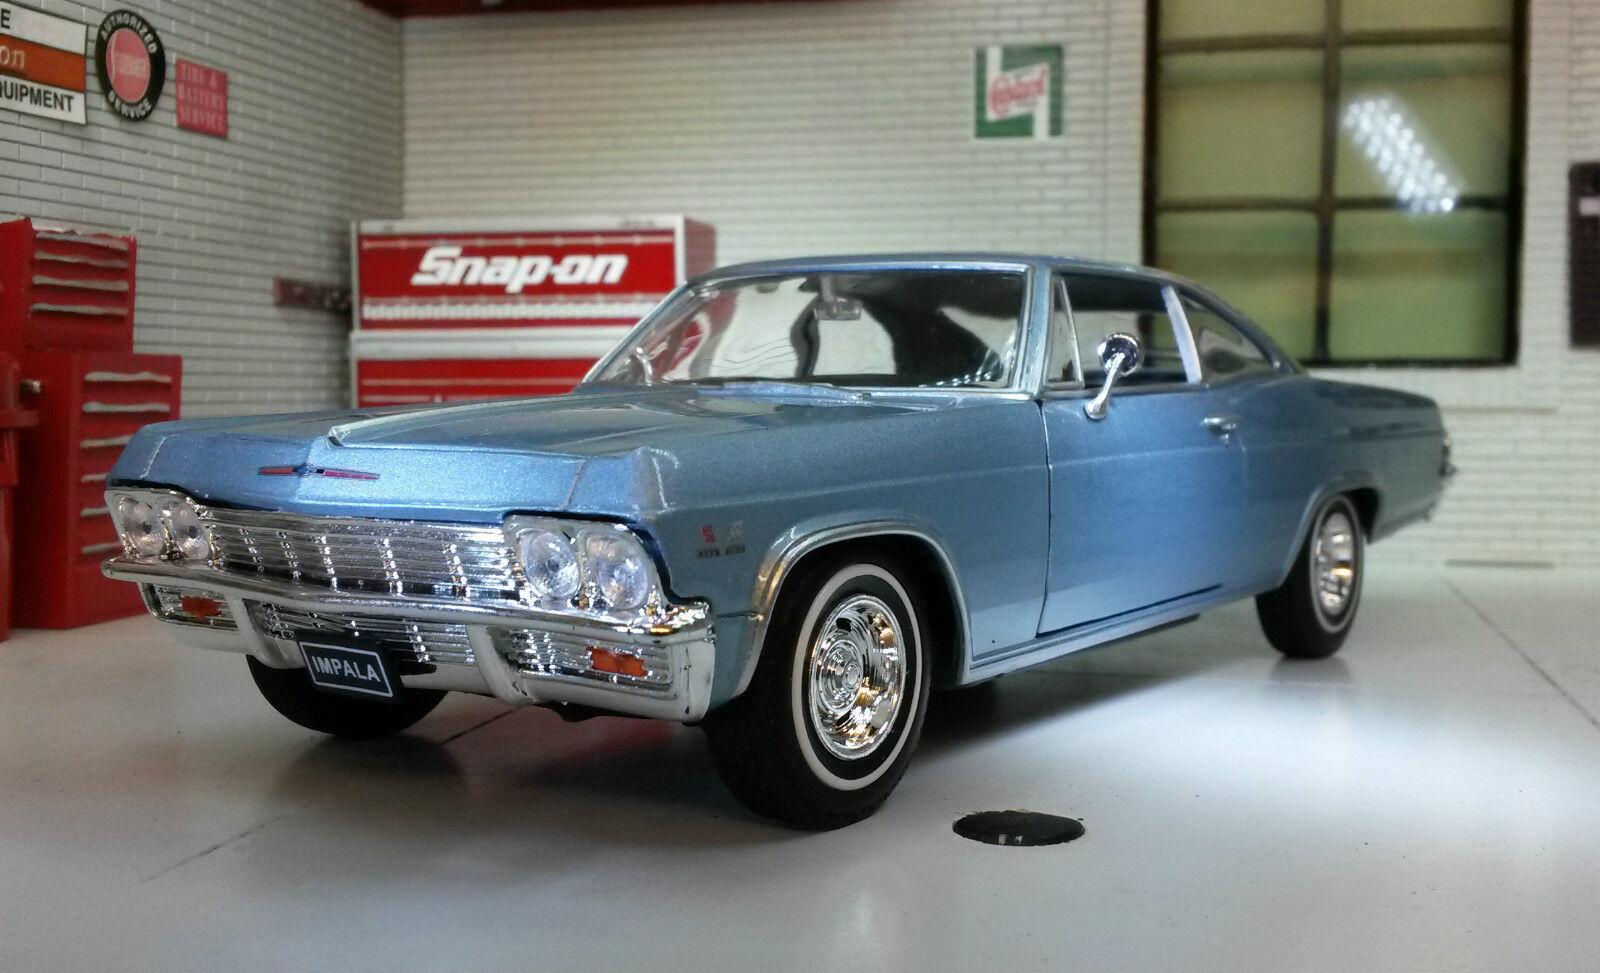 Chevrolet Impala S 396 1965 1